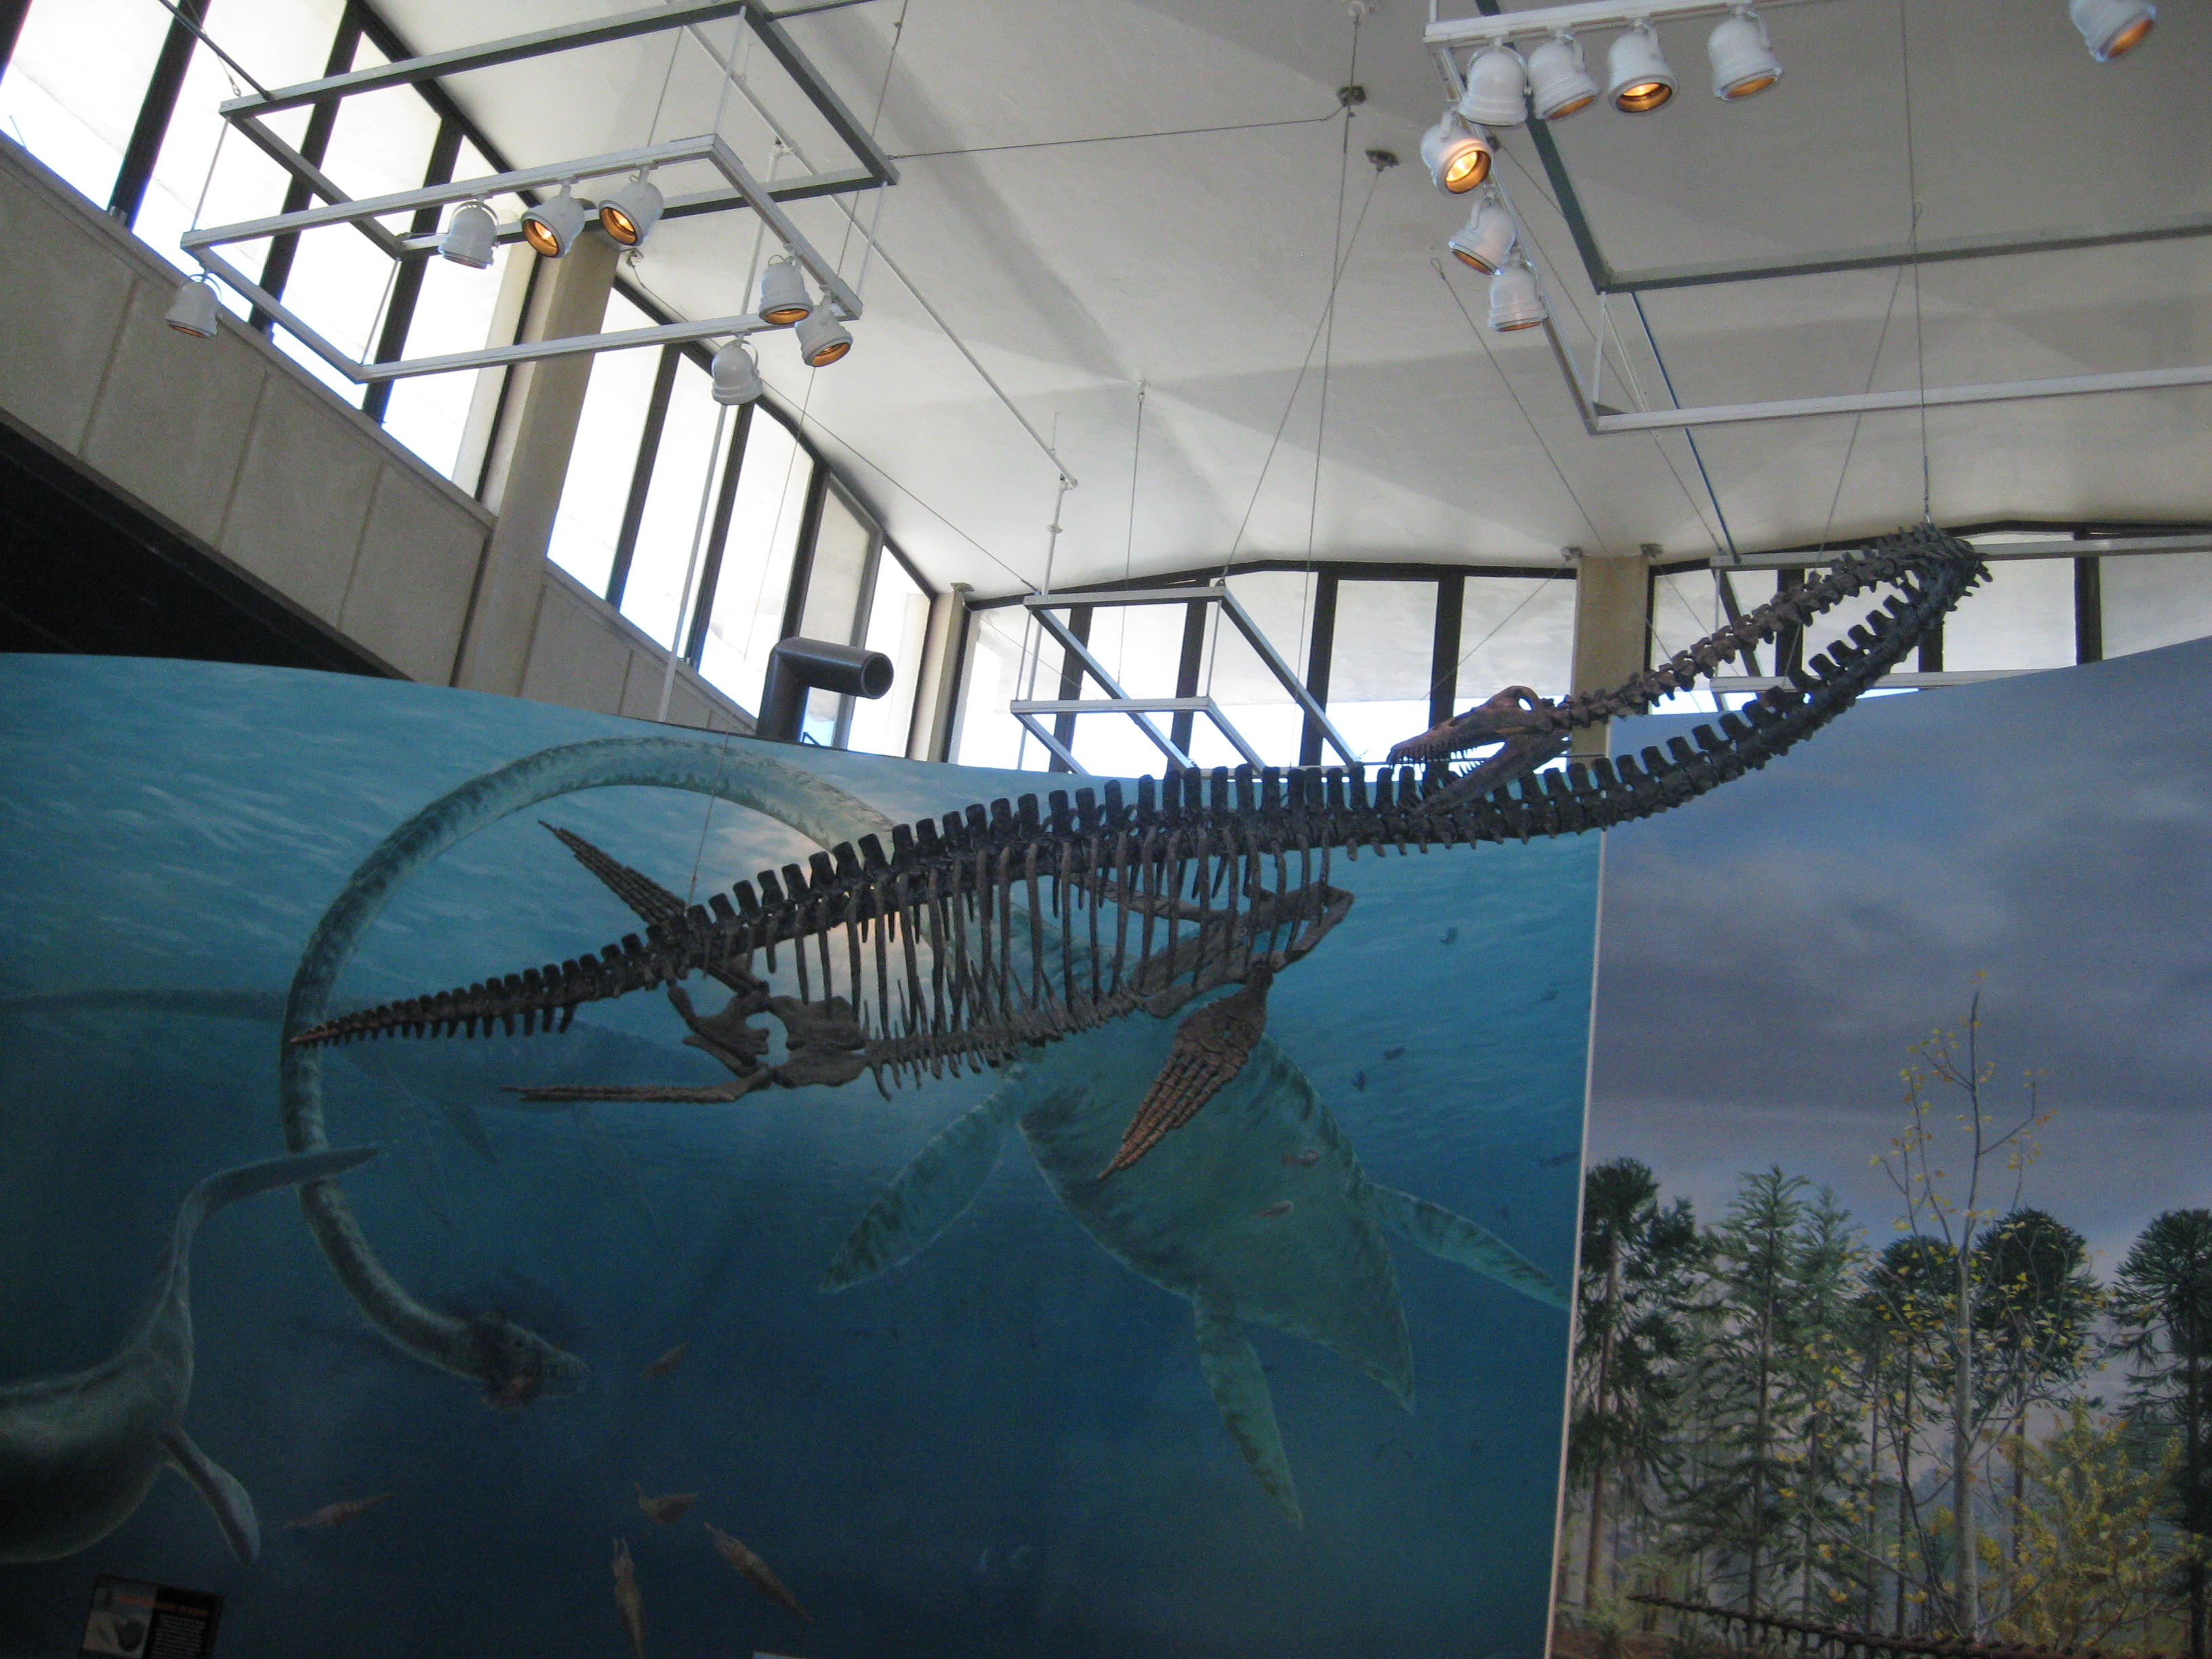 File:Elasmosaurus Skeleton.jpg - Wikimedia Commons